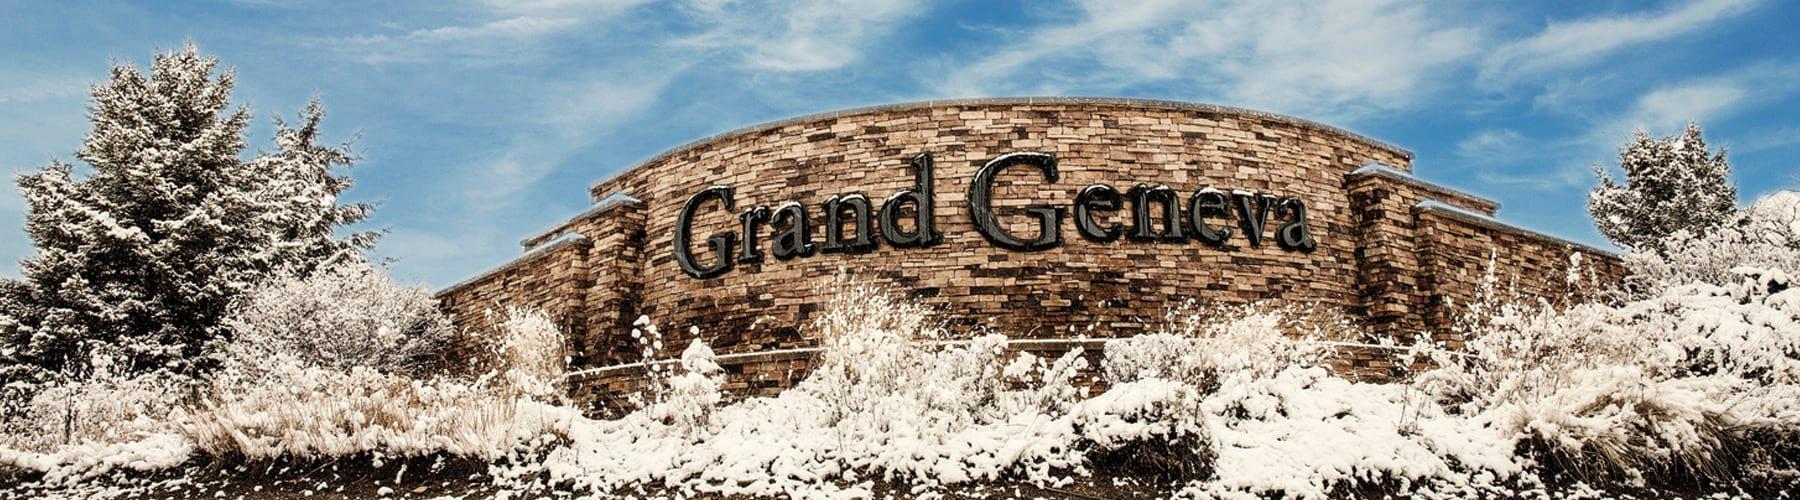 About Grand Geneva - FAQ | Grand Geneva Resort & Spa